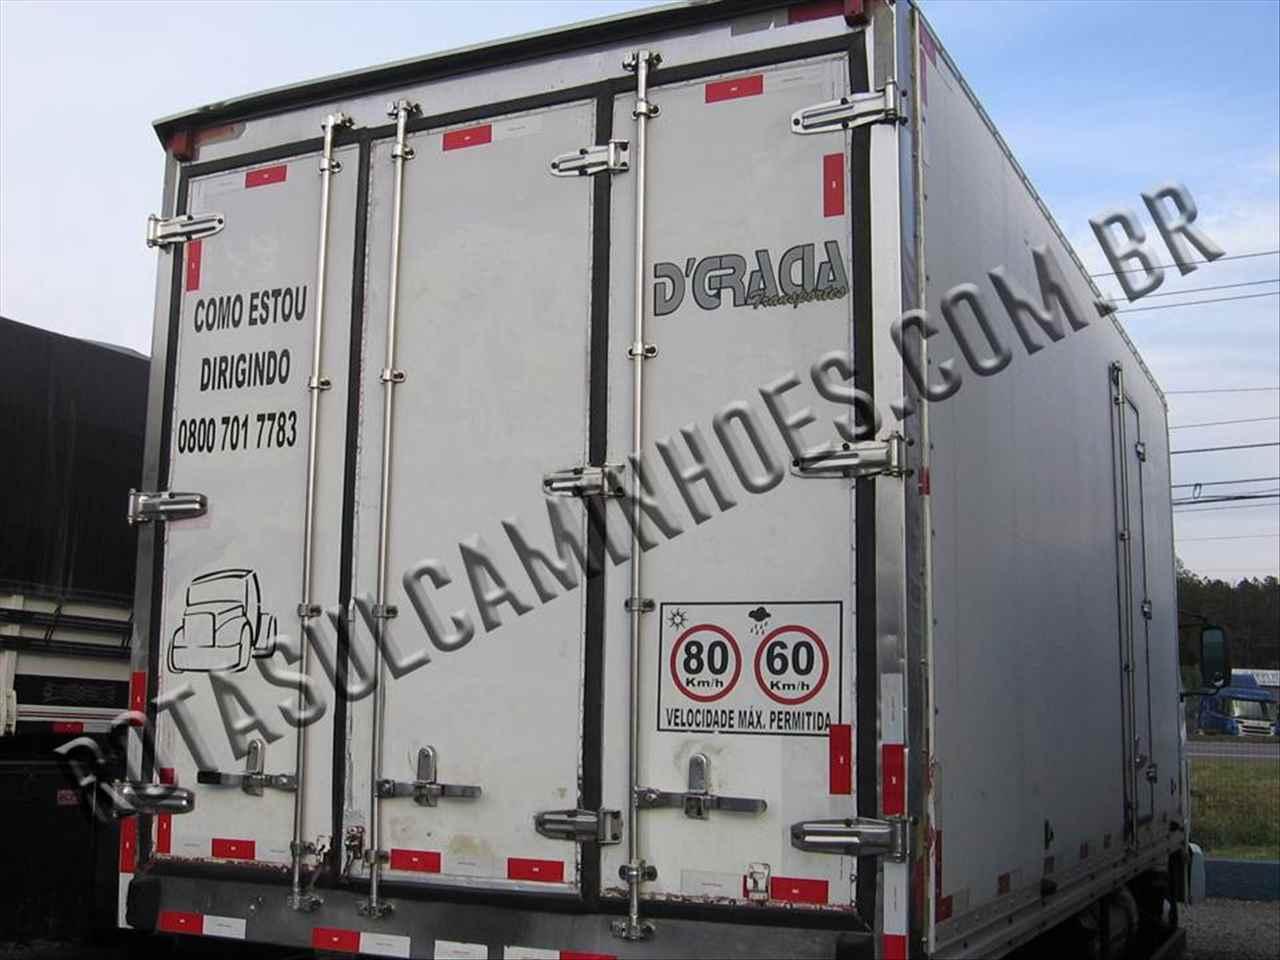 curitiba%2fparana%2fcamara-fria%2f01%2fcaminhao%2fagrale-ford-mercedes-benz-volkswagen%2fagrale-7500-agrale-8500-agrale-8500-ce-agrale-9200-cargo-712-cargo-814-cargo-815-cargo-816-mb-815-mb-915-vw-7100%2frota-sul-caminhoes%2f12362